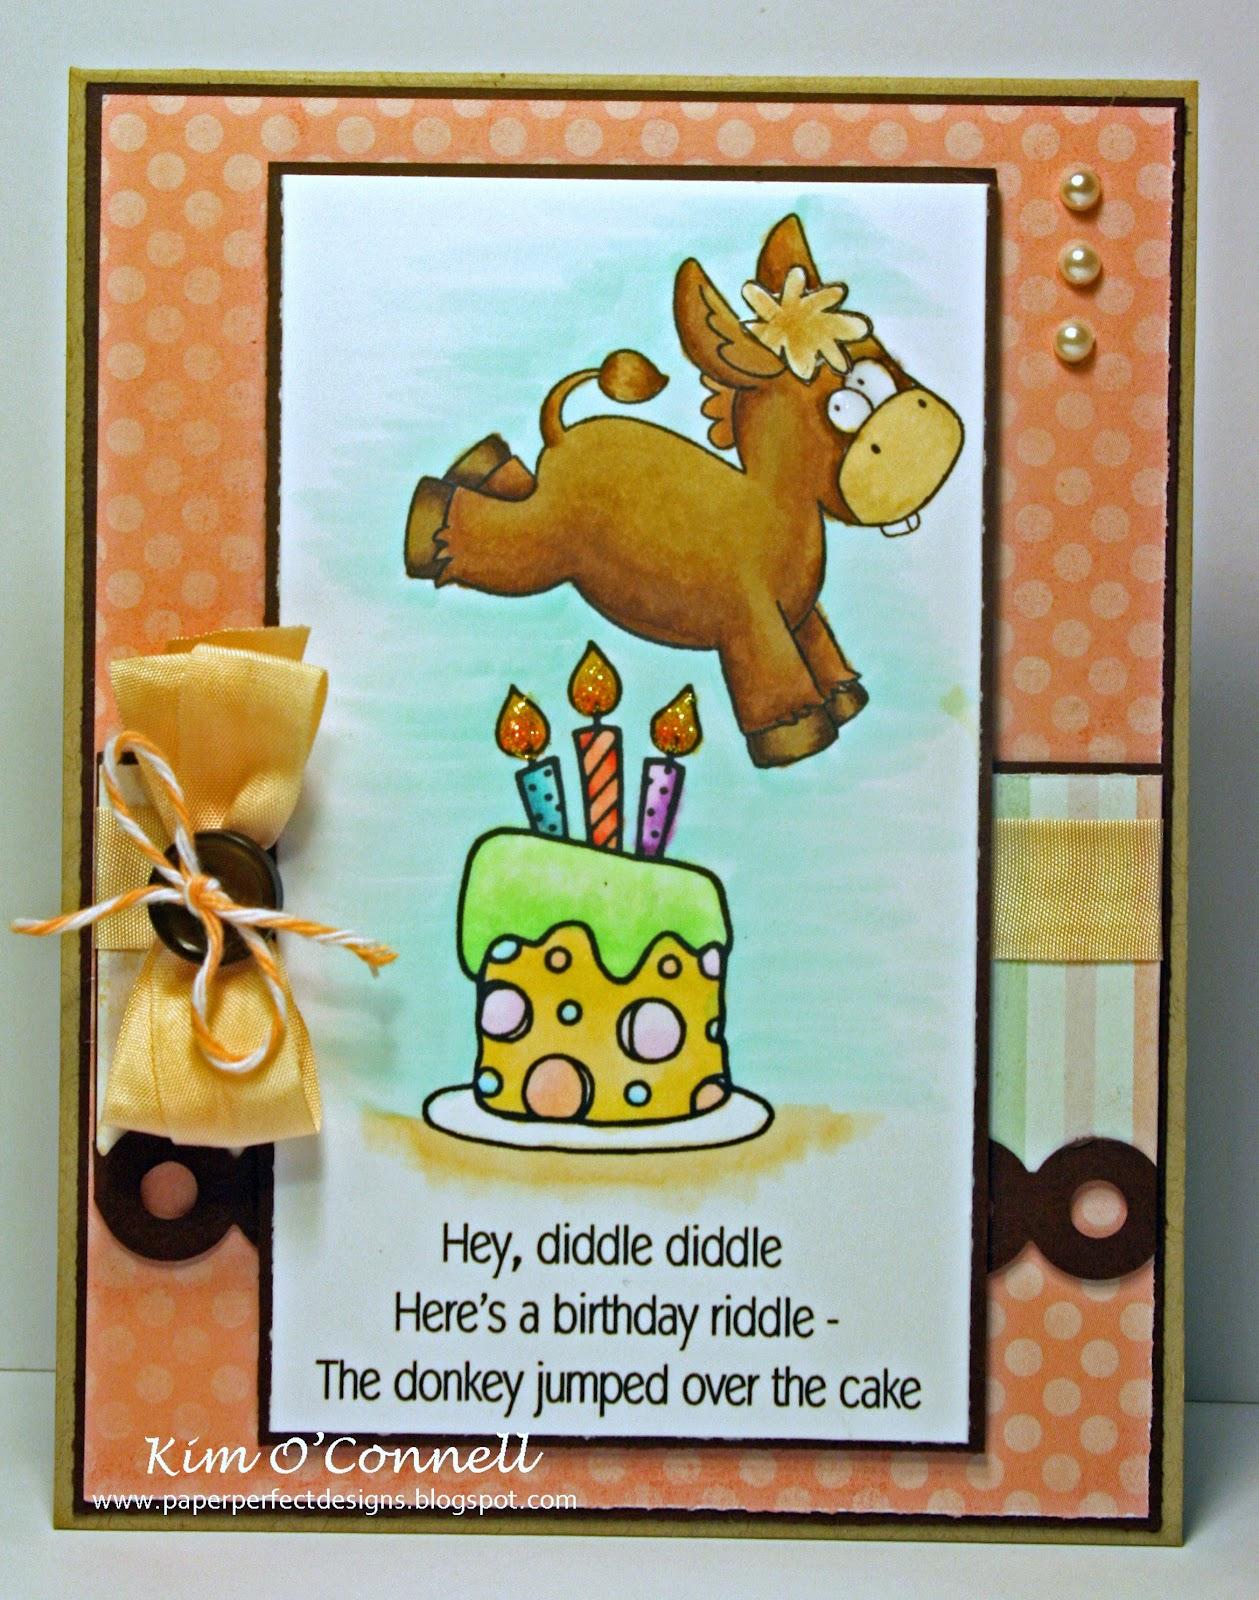 Creative Smiles RCC42 The Donkey jumps over the cake – Donkey Birthday Card